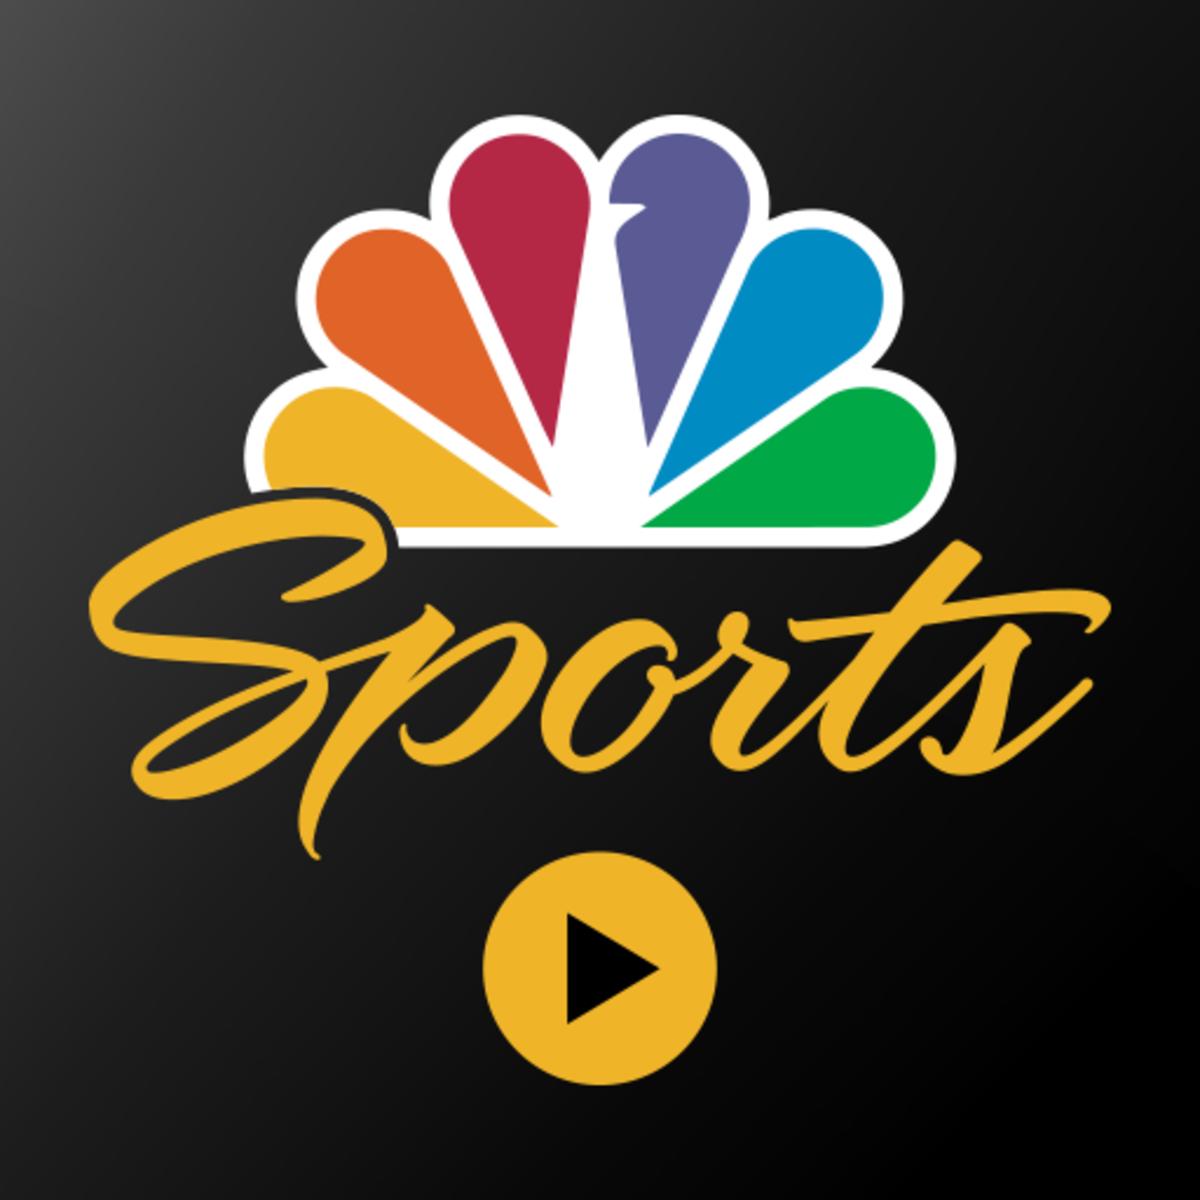 NASCAR live stream: NBC Sports Live